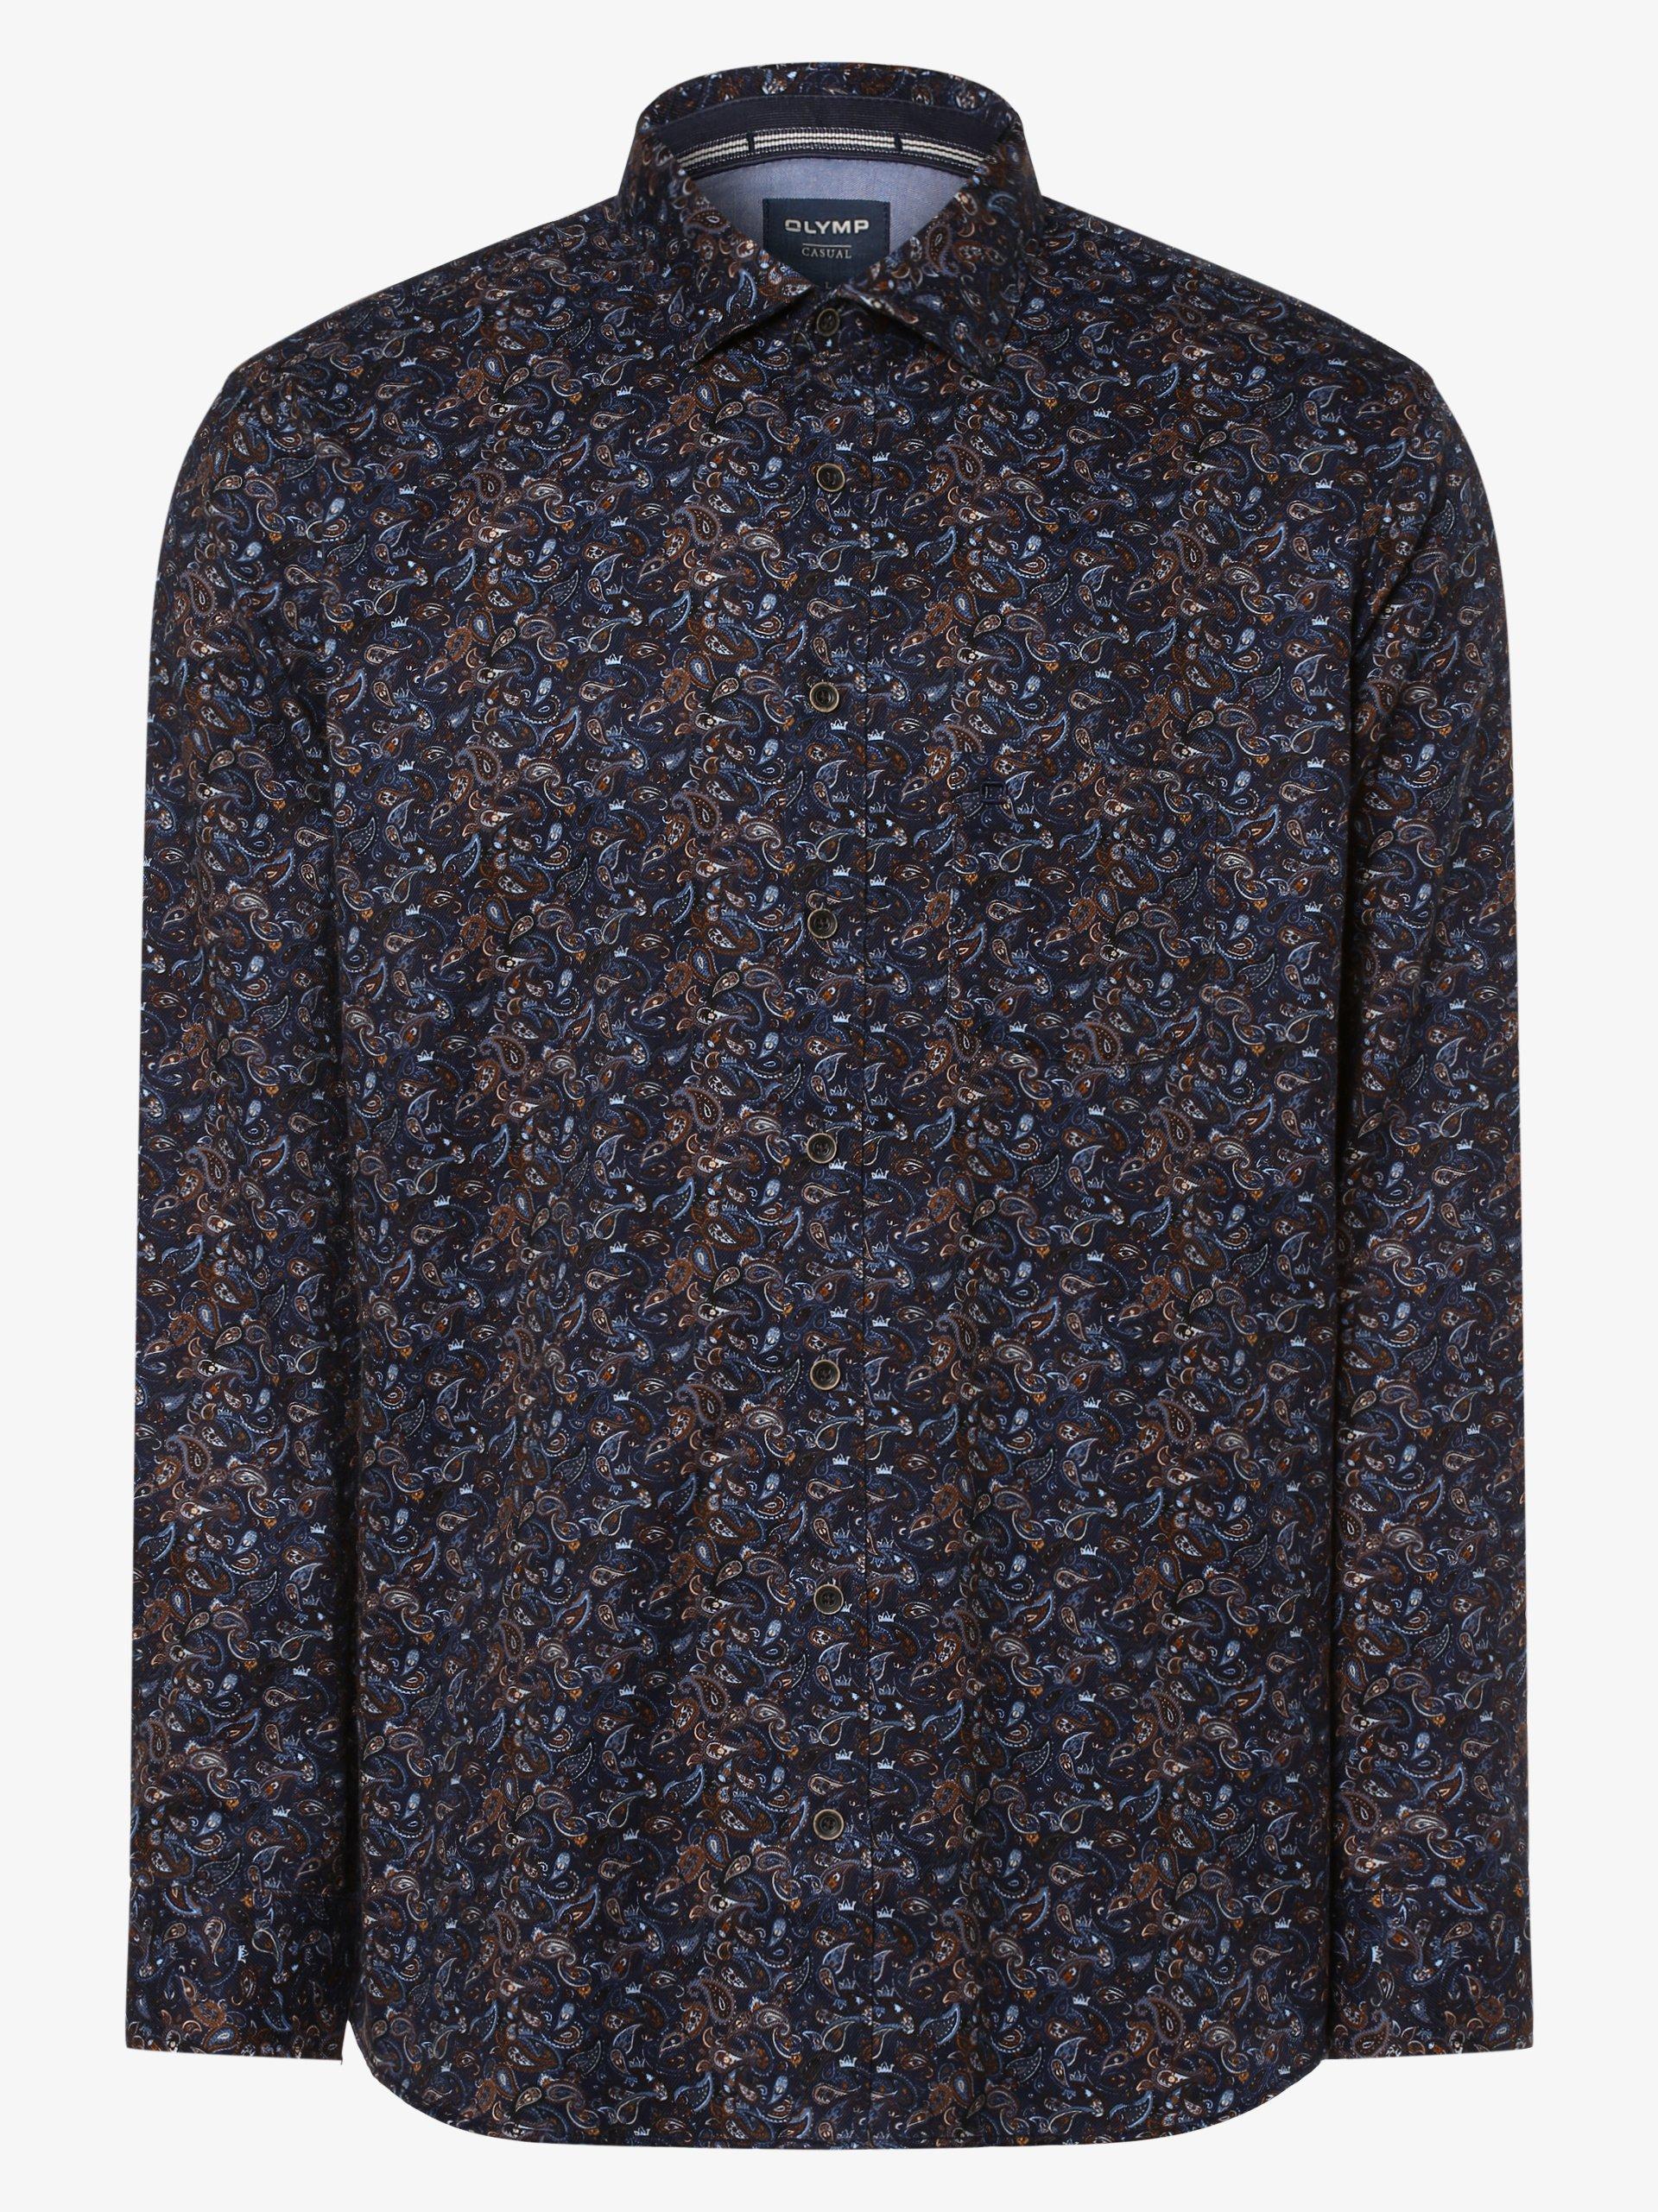 OLYMP Casual modern fit Koszula męska – Two Ply